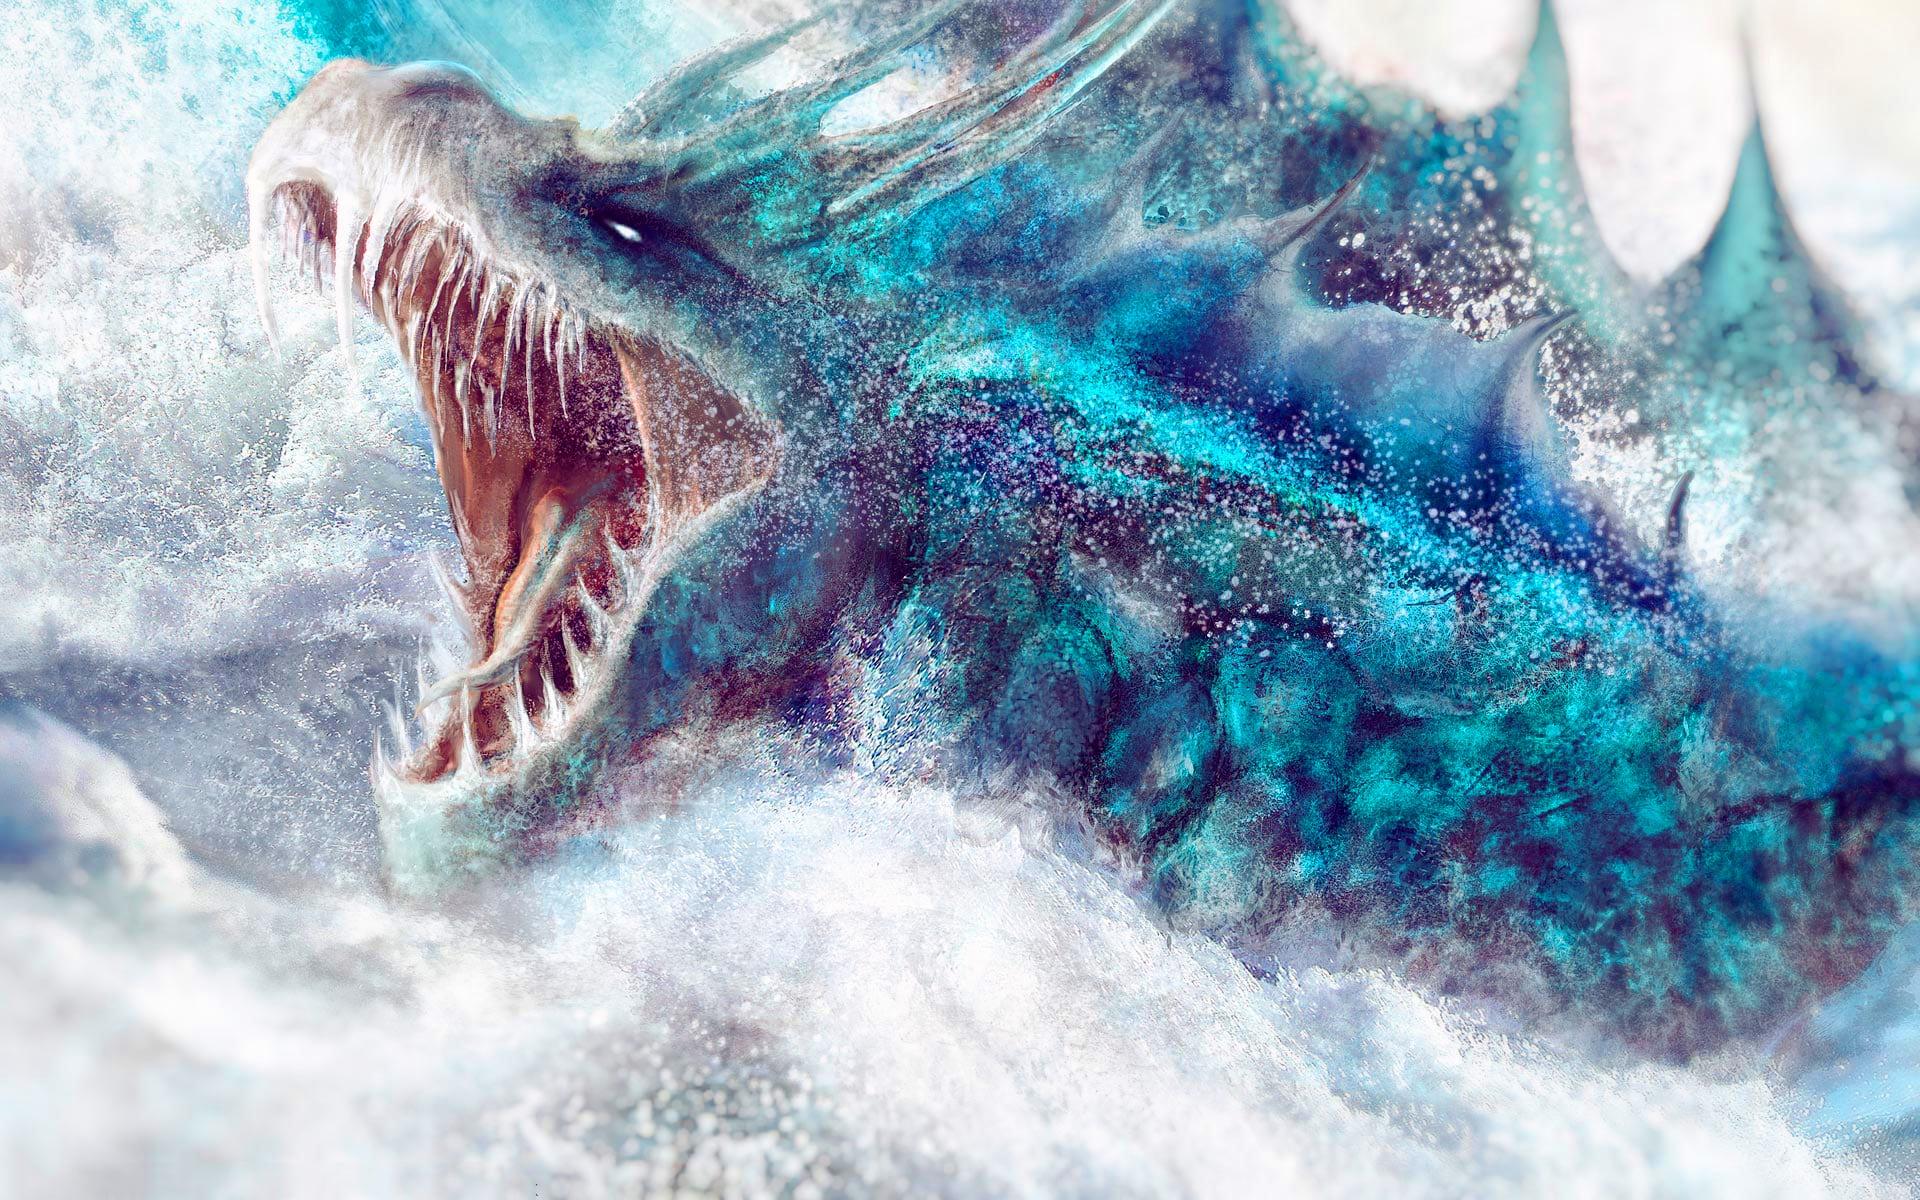 Moustro marino real